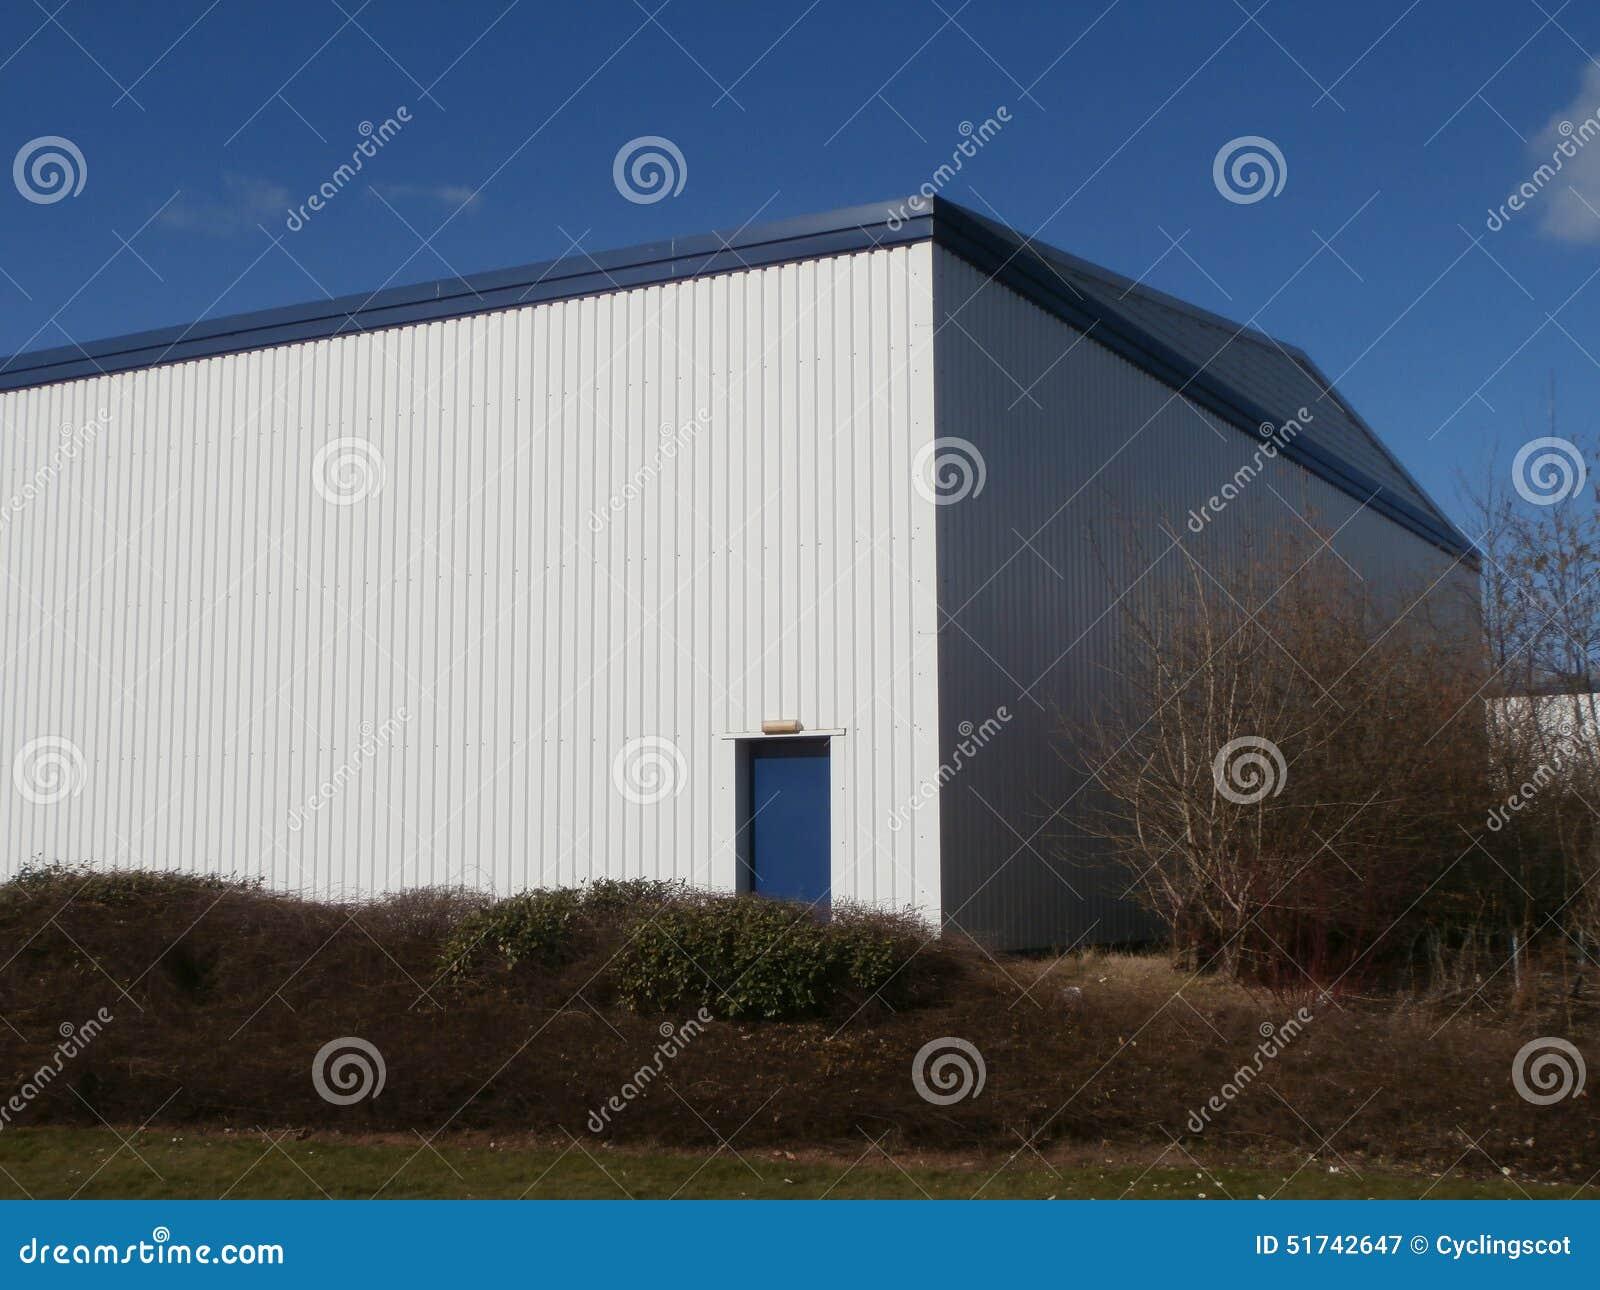 côté du bâtiment industriel moderne image stock - image du moderne